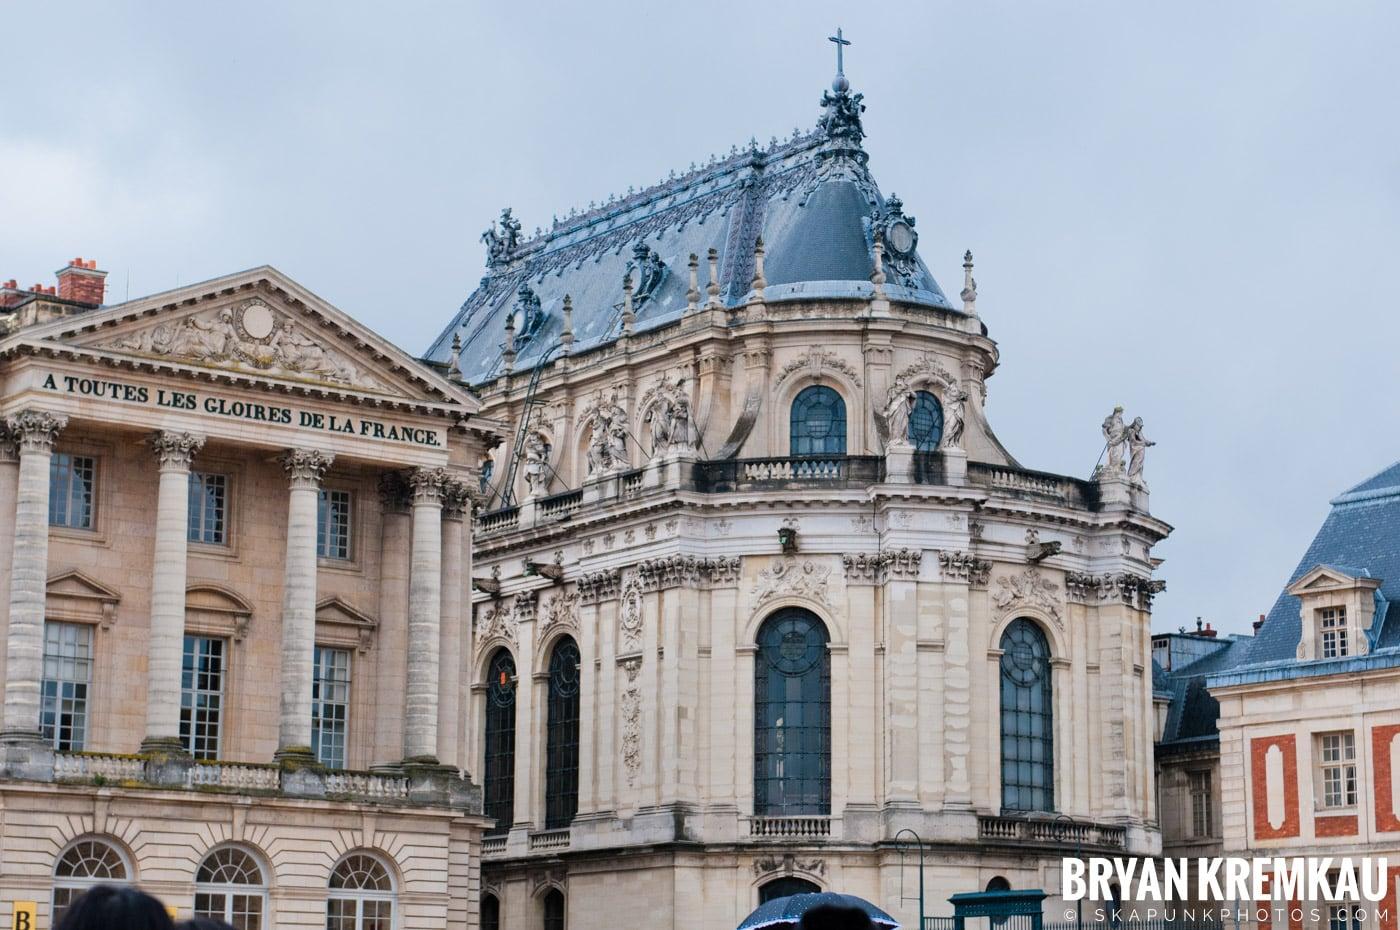 Paris, France Honeymoon - Day 2 - 7.19.11 (3)